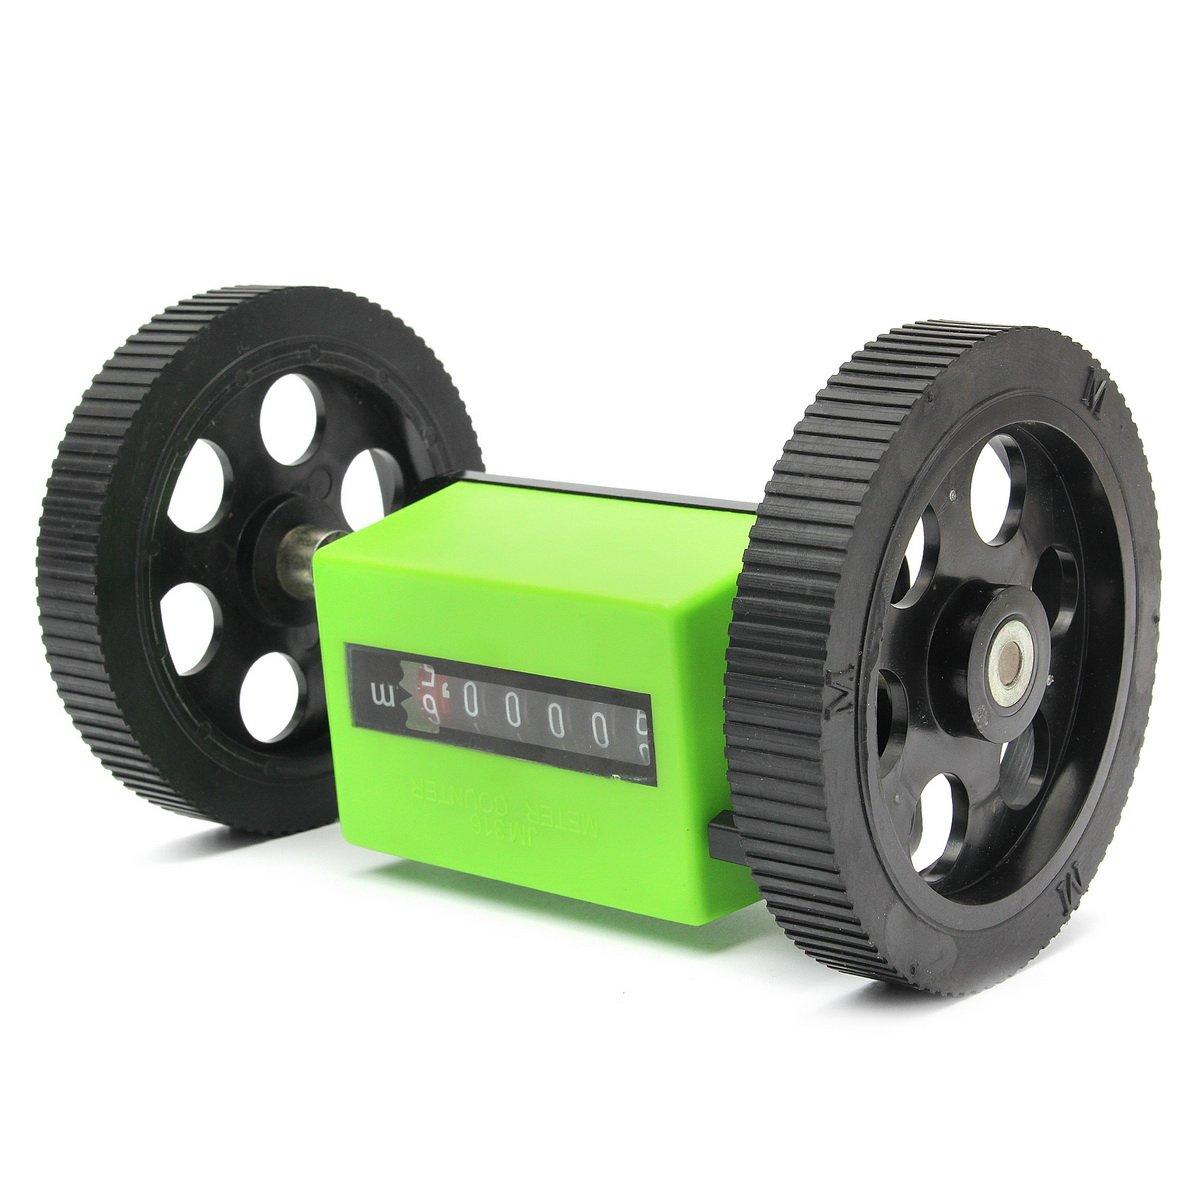 Tutoy Textil Druck Färben Meter Zähler Rolling Wheel Mechanical Length Counter B074W4DV1J | Reparieren